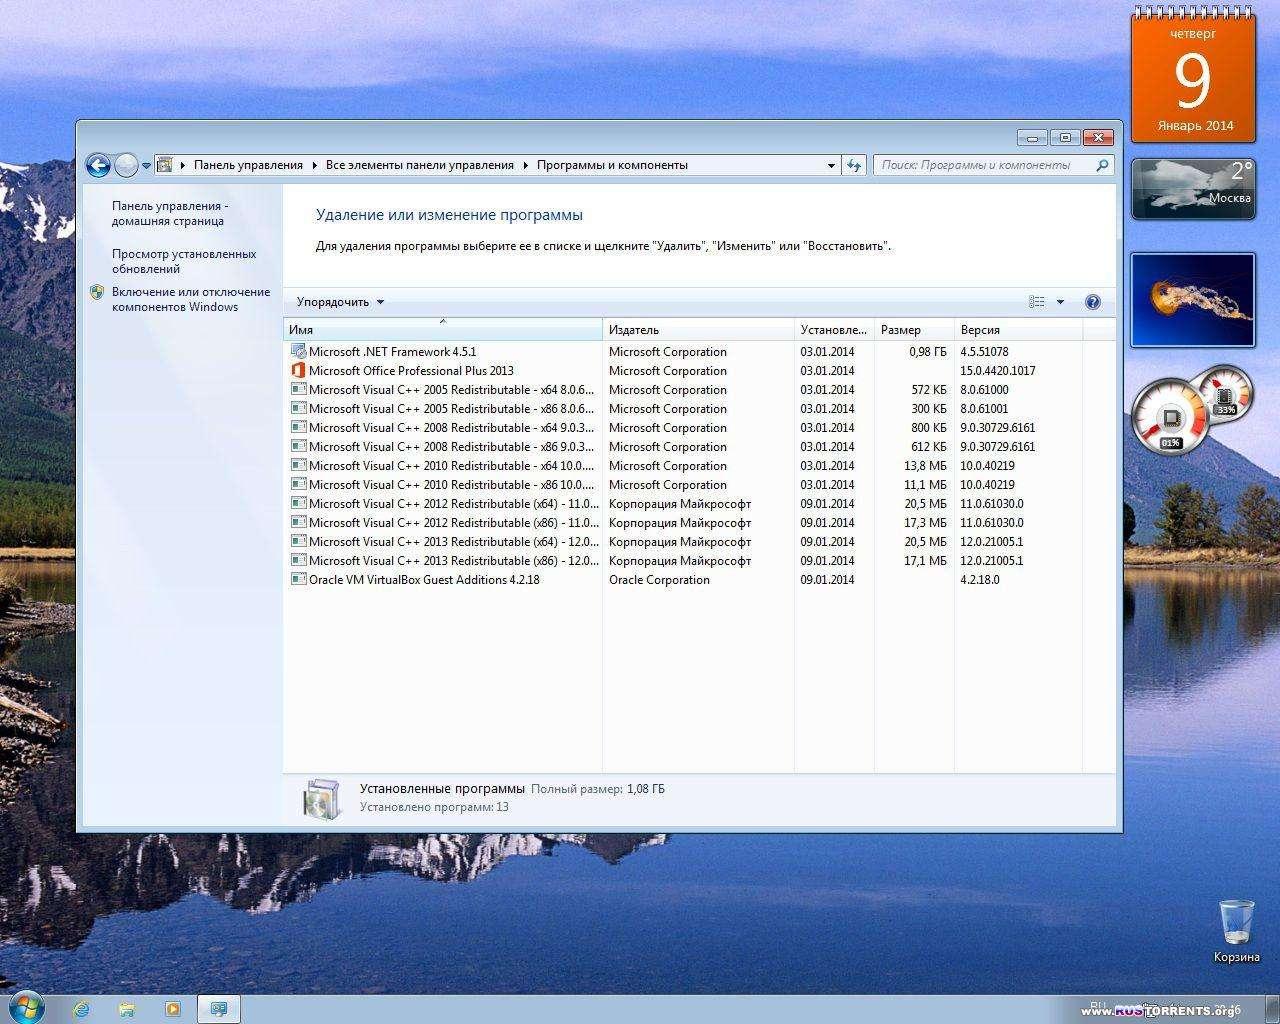 Windows 7 SP1 + Office 2013 26in1 (x86/x64) by SmokieBlahBlah 08.01.2014 RUS/ENG